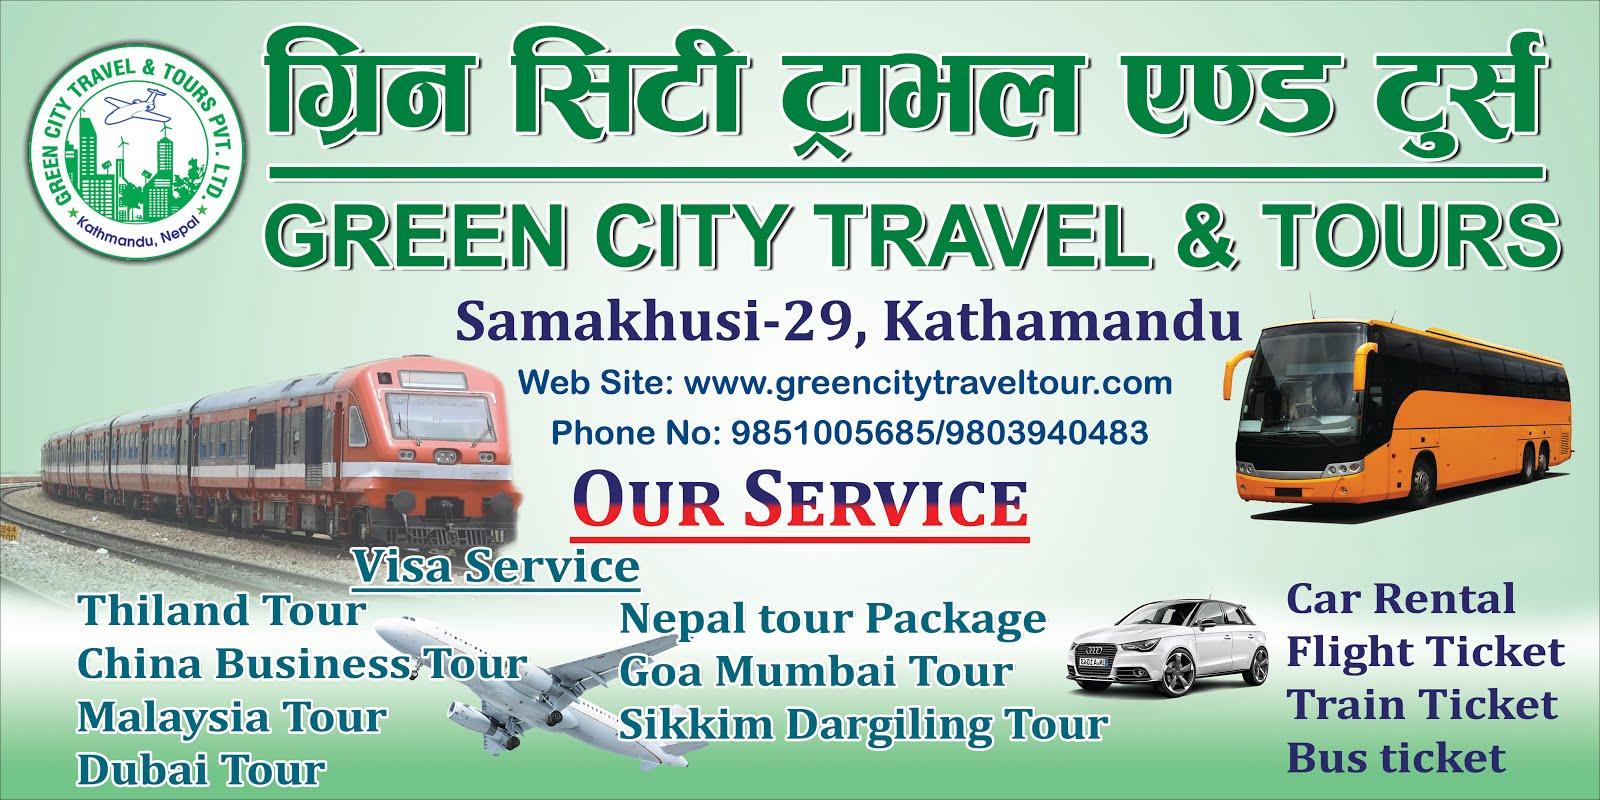 Kathmandu to delhi direct bus ticket|Kathmandu delhi bus ticket counter| Price ,distance ktm delhi